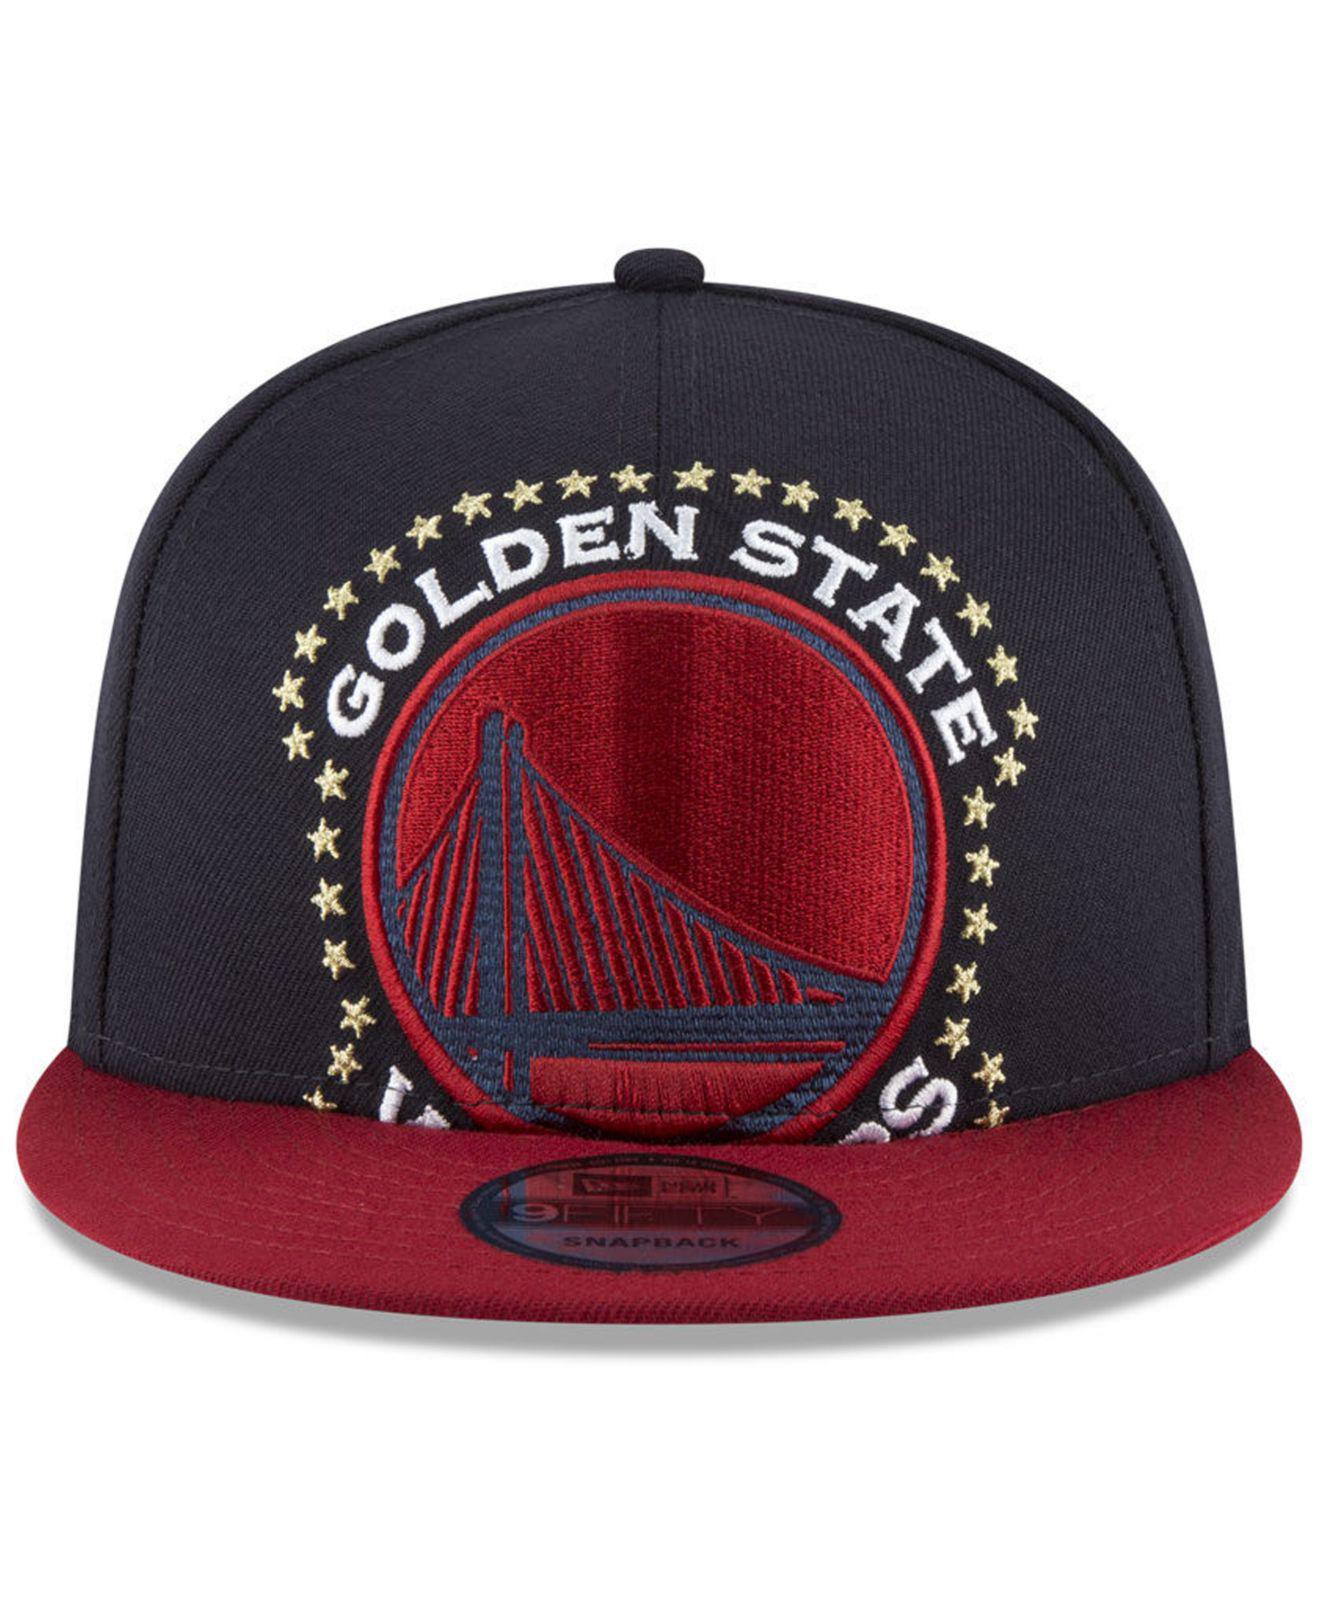 558501c4118f23 order lyst ktz golden state warriors xl americana 9fifty snapback cap in  blue for men 57766